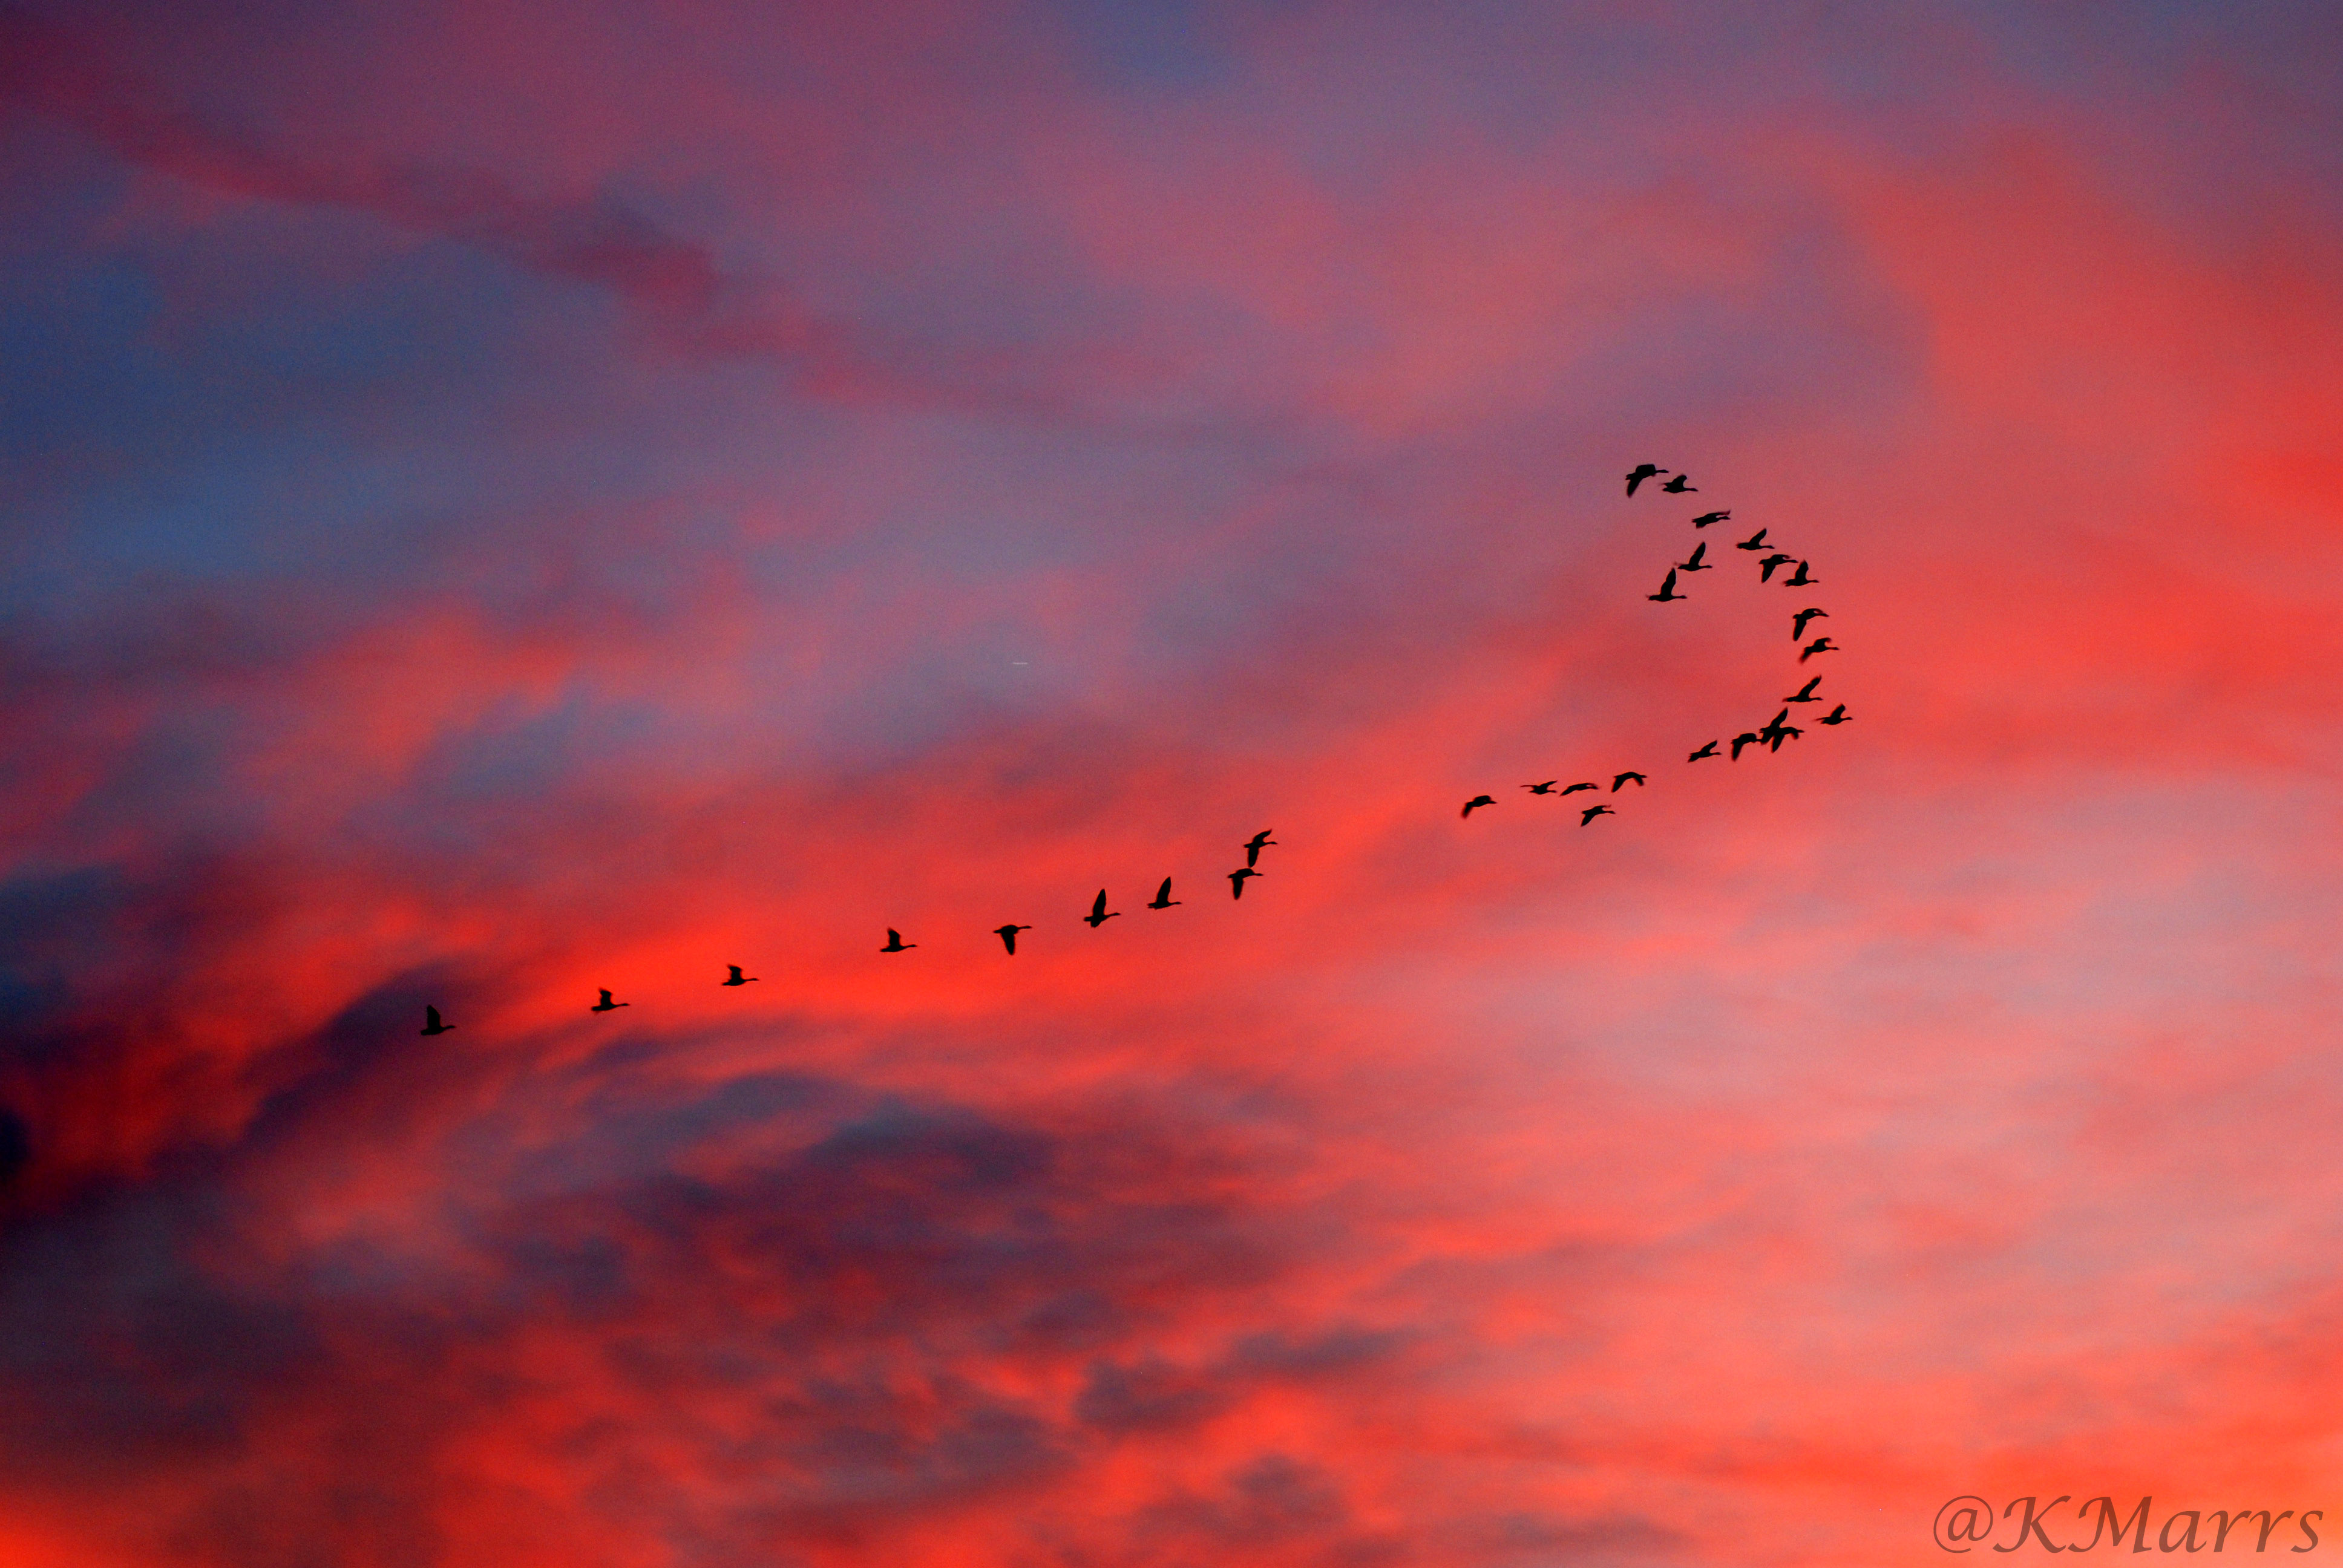 Dusk Sunset photography blog borderline personality disorder BPD